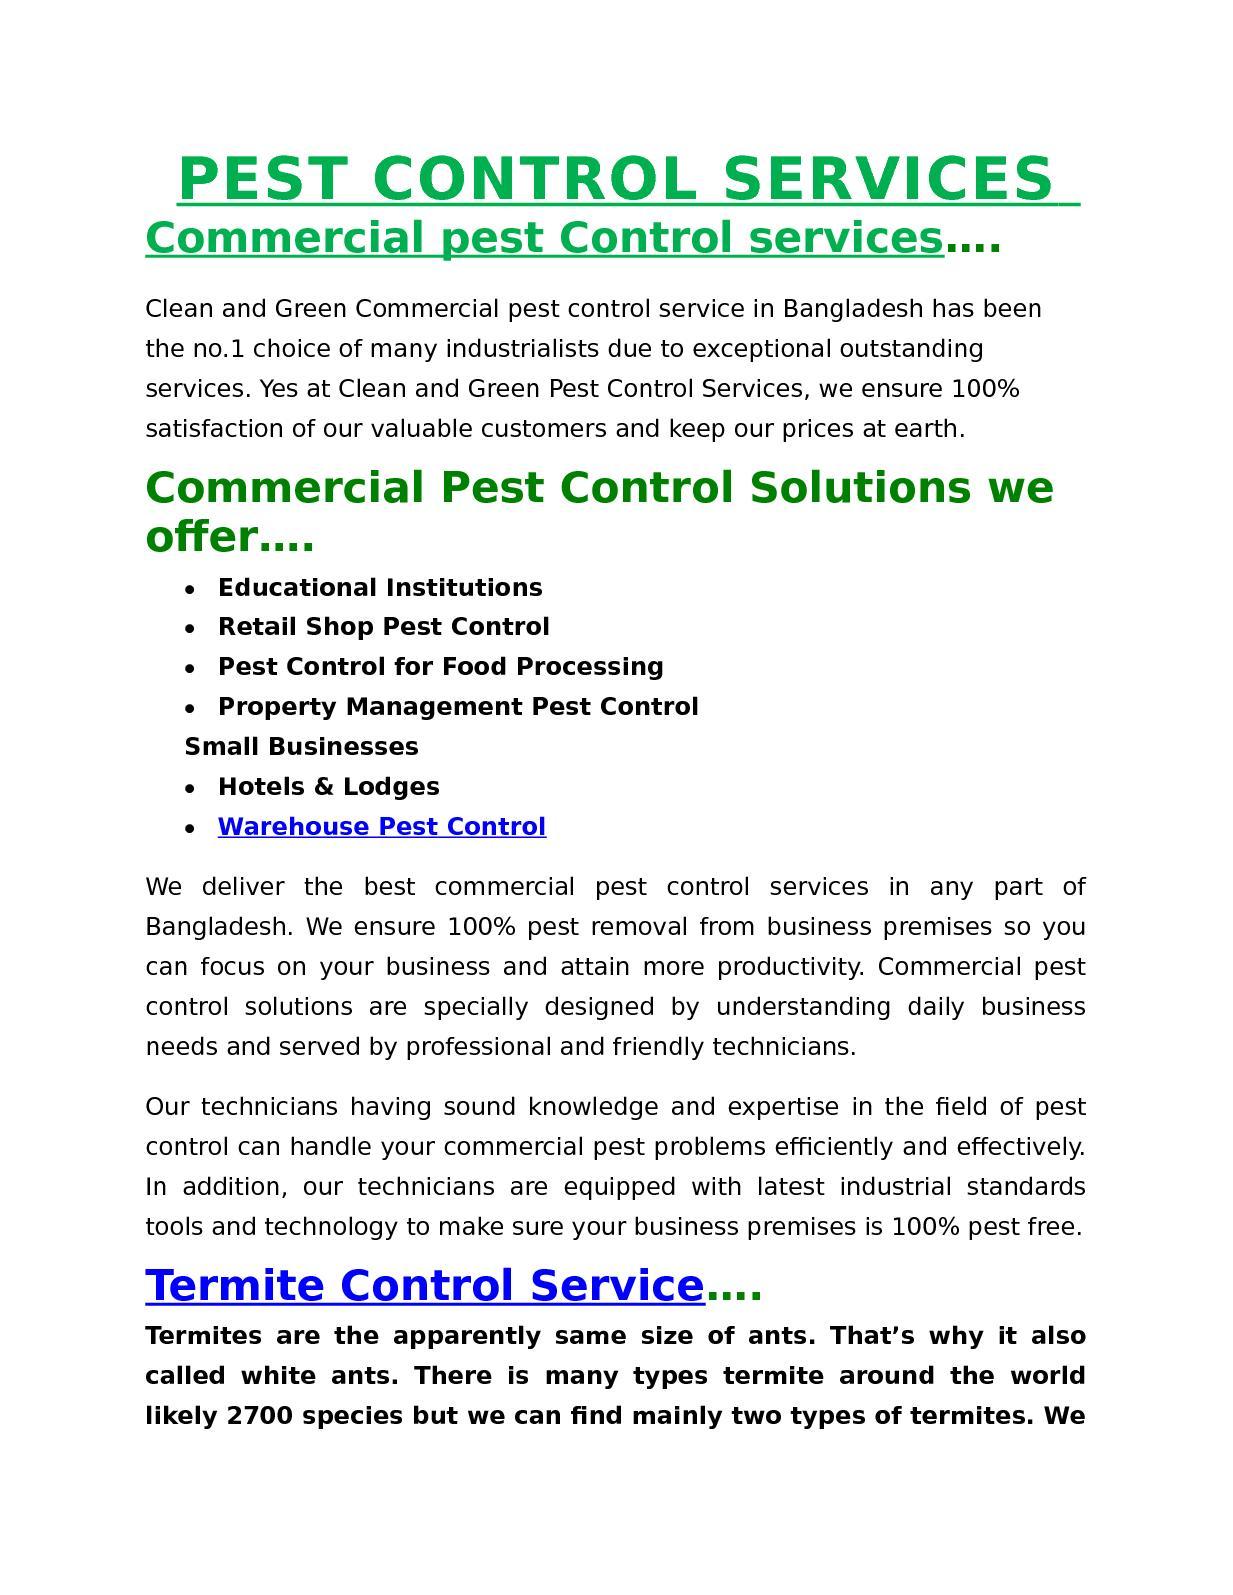 Calaméo - Pest Control Services